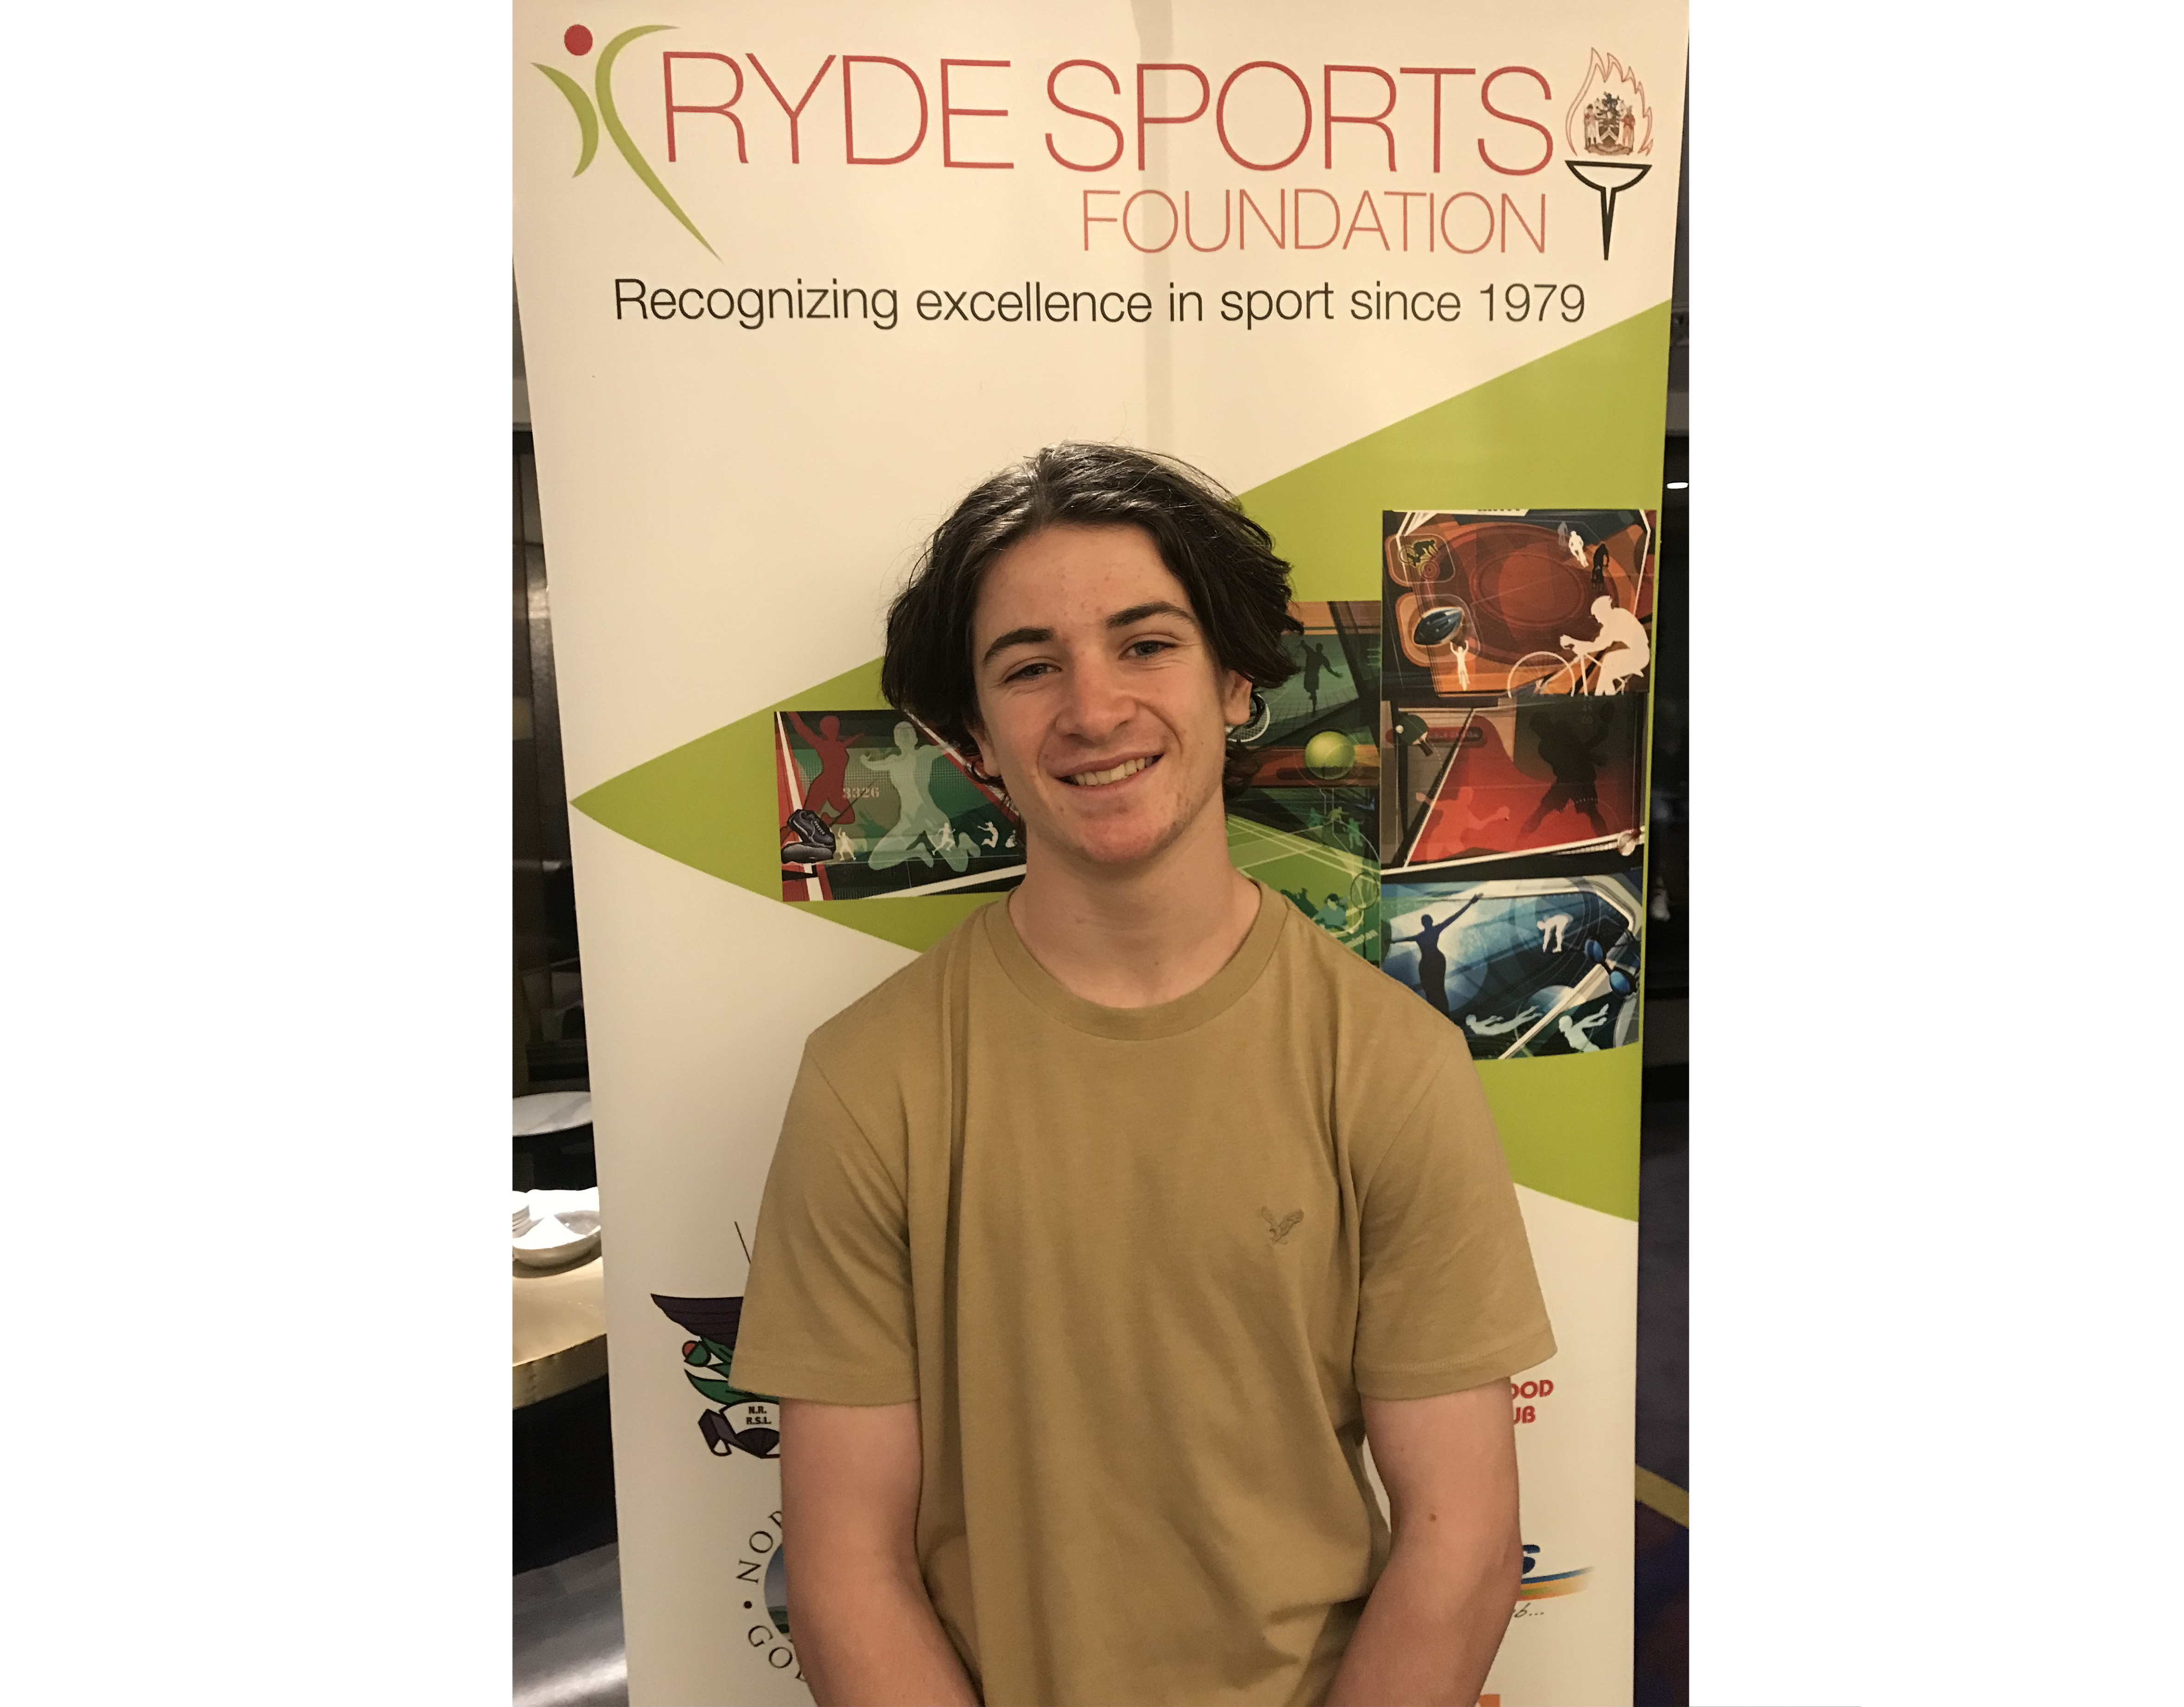 Josh Arcus, Ryde Sports Foundation September 2019 Sports Star